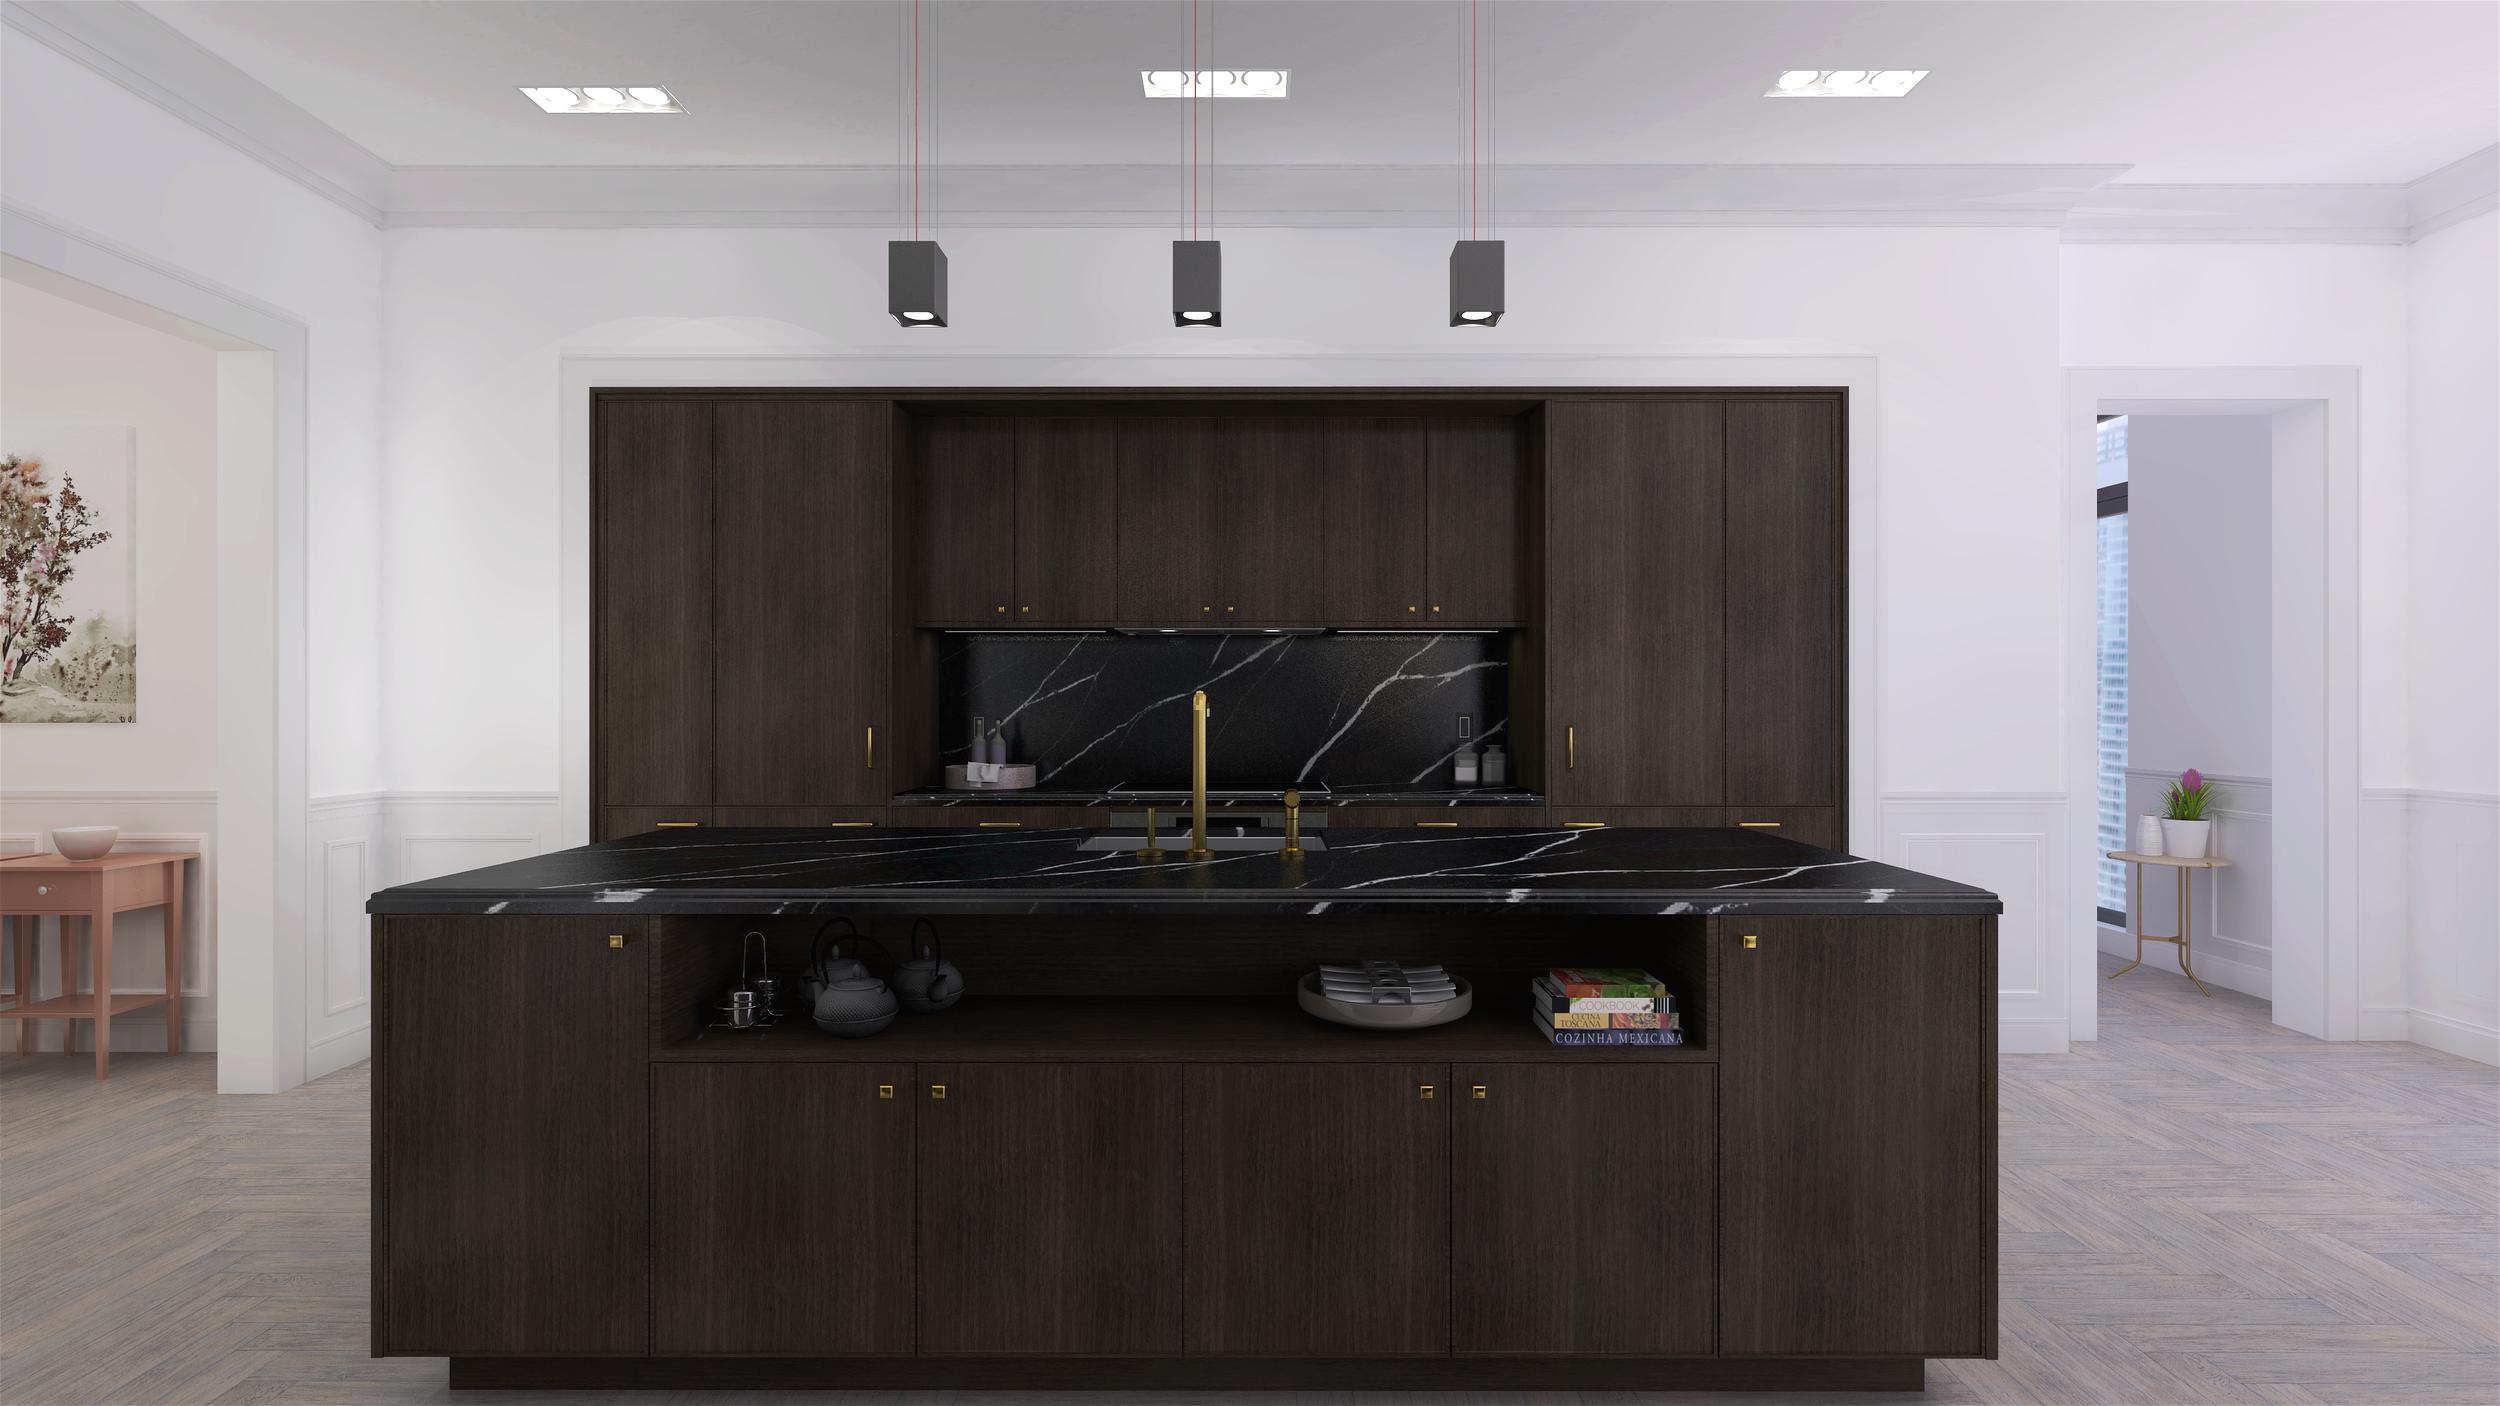 deSousaDESIGN_Kitchen_Classic_Modern_V1a_3840x2160.png